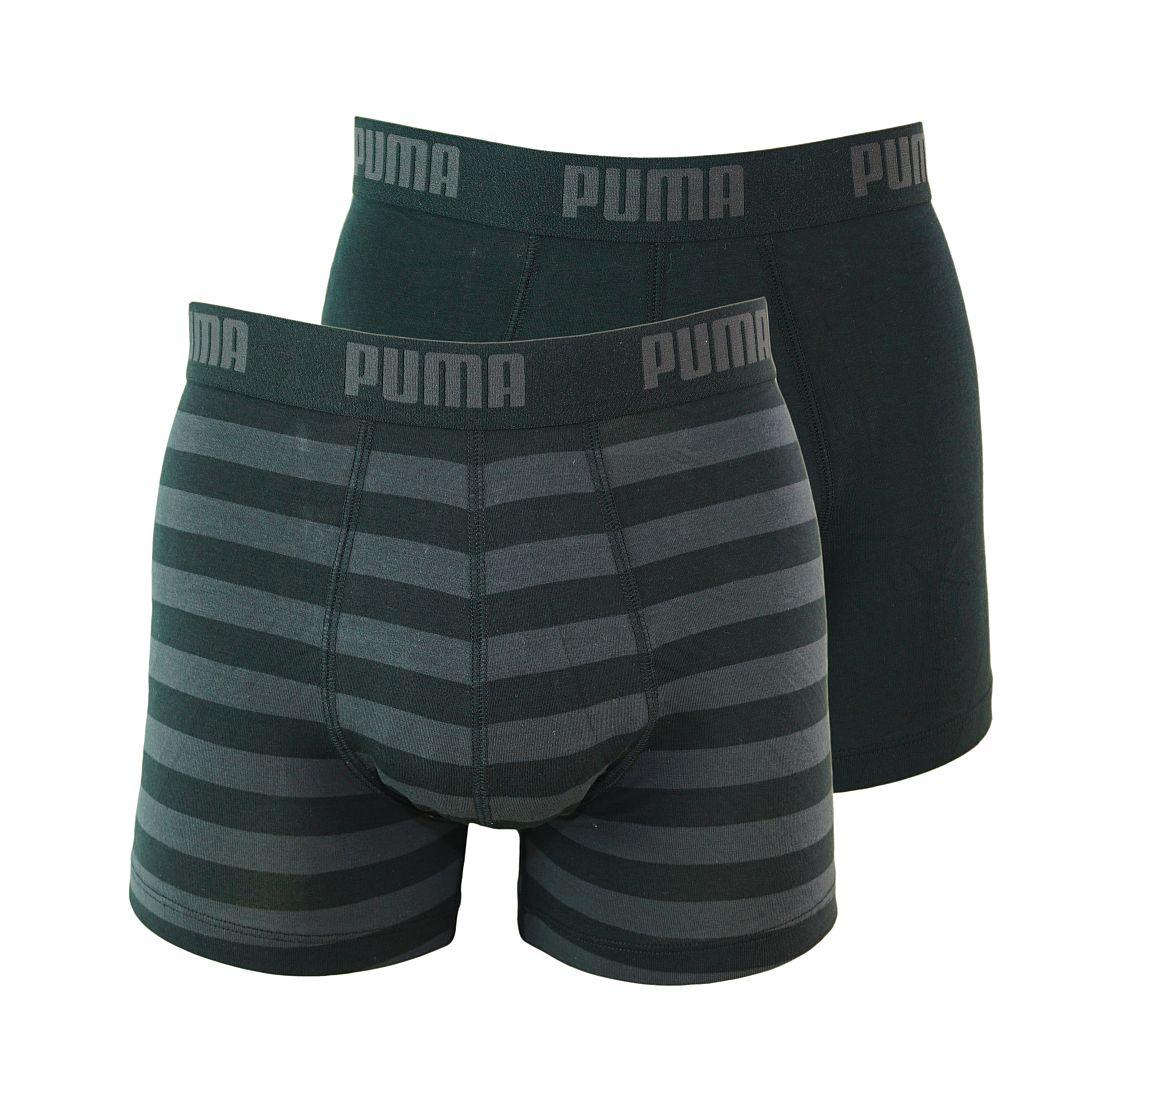 PUMA Shorts Unterhosen 2er Pack Boxer 651001001 200 020 black SF17-PMS1